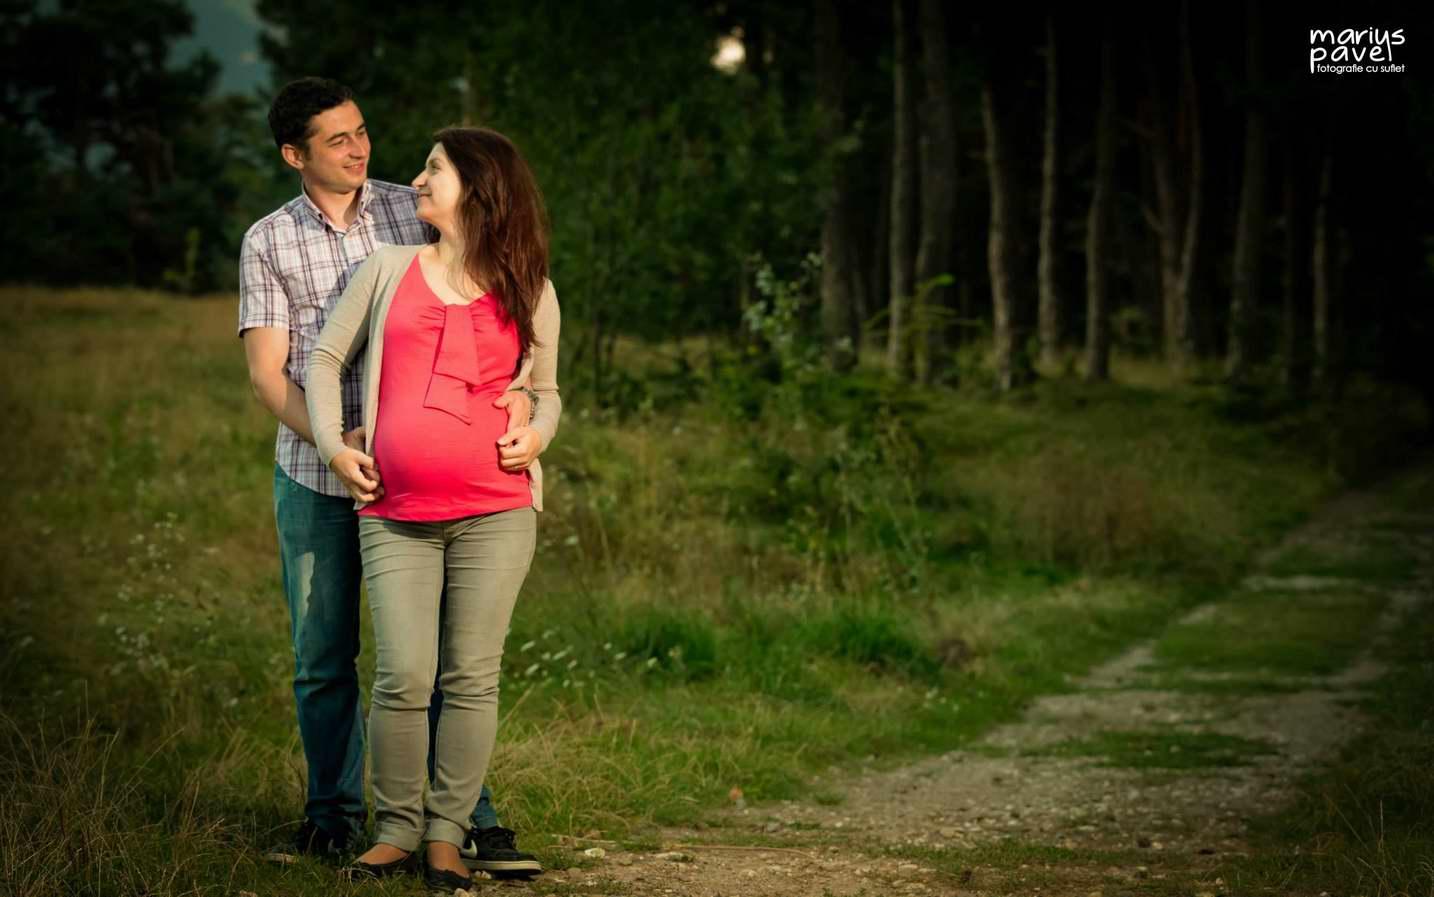 Fotografie gravida Brasov - sedinta foto inainte de nastere